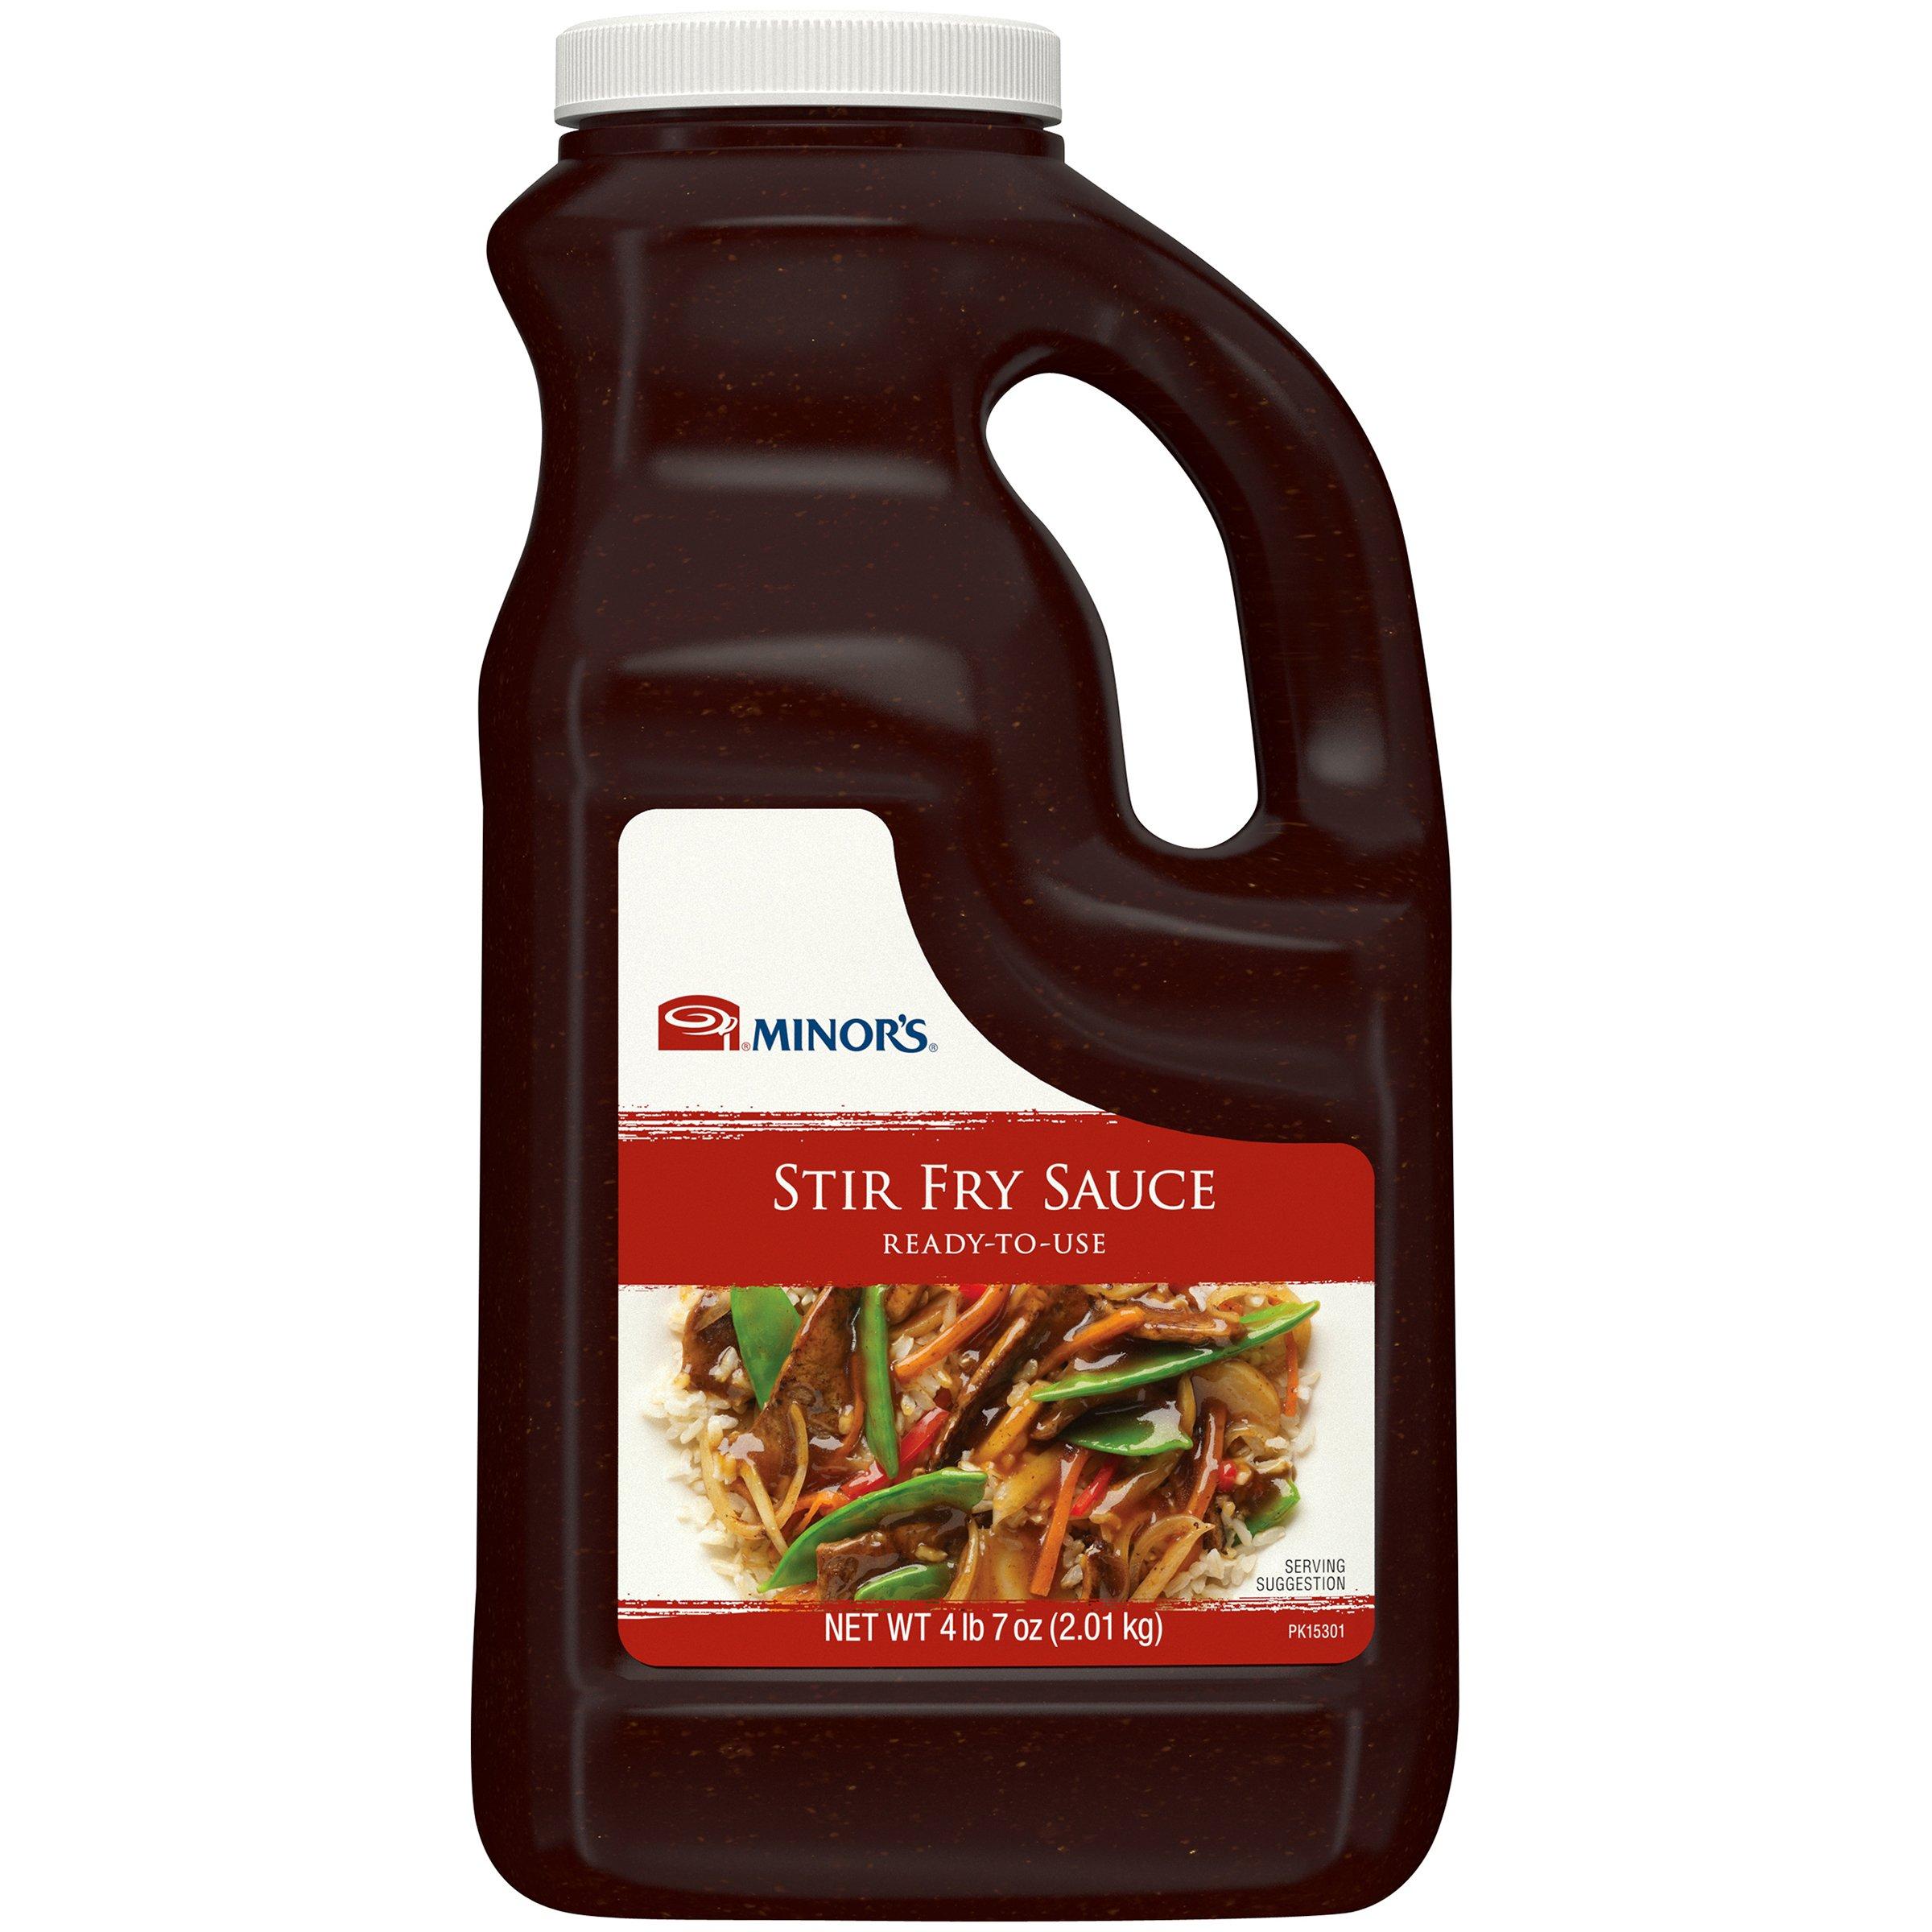 Minor's Stir Fry Sauce, Shelf Stable, Marinade, 4 lb 7 oz Bulk Bottle